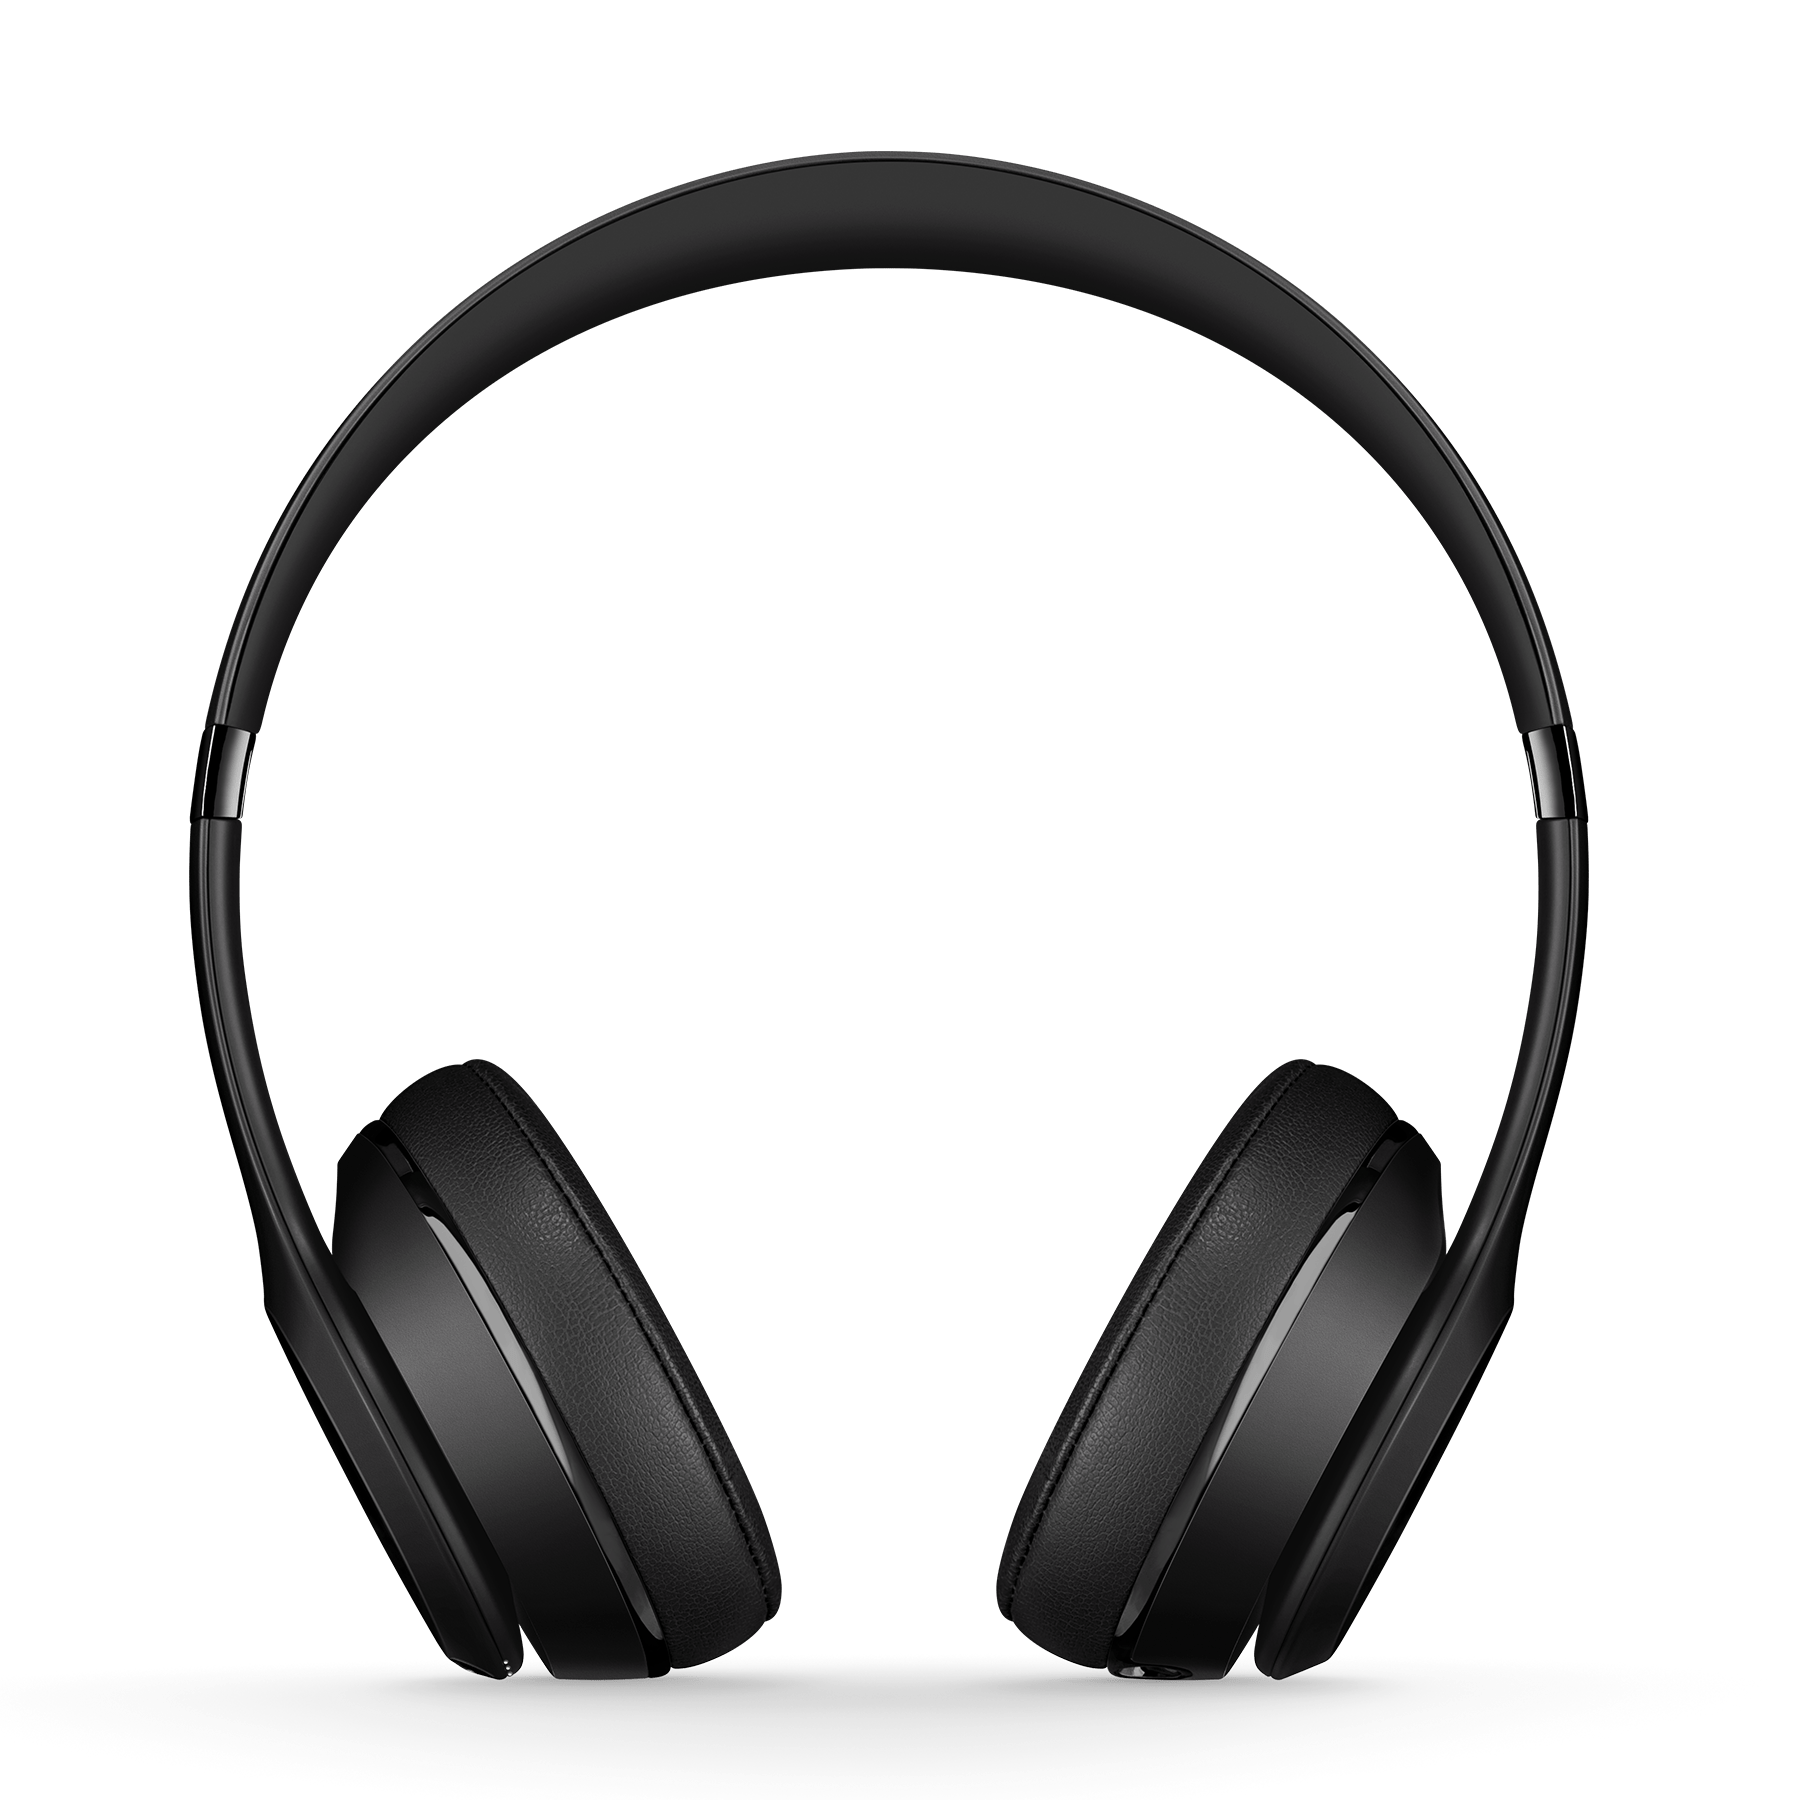 Headphone clipart bluetooth headphone. Anime headphones wallpapers desktop